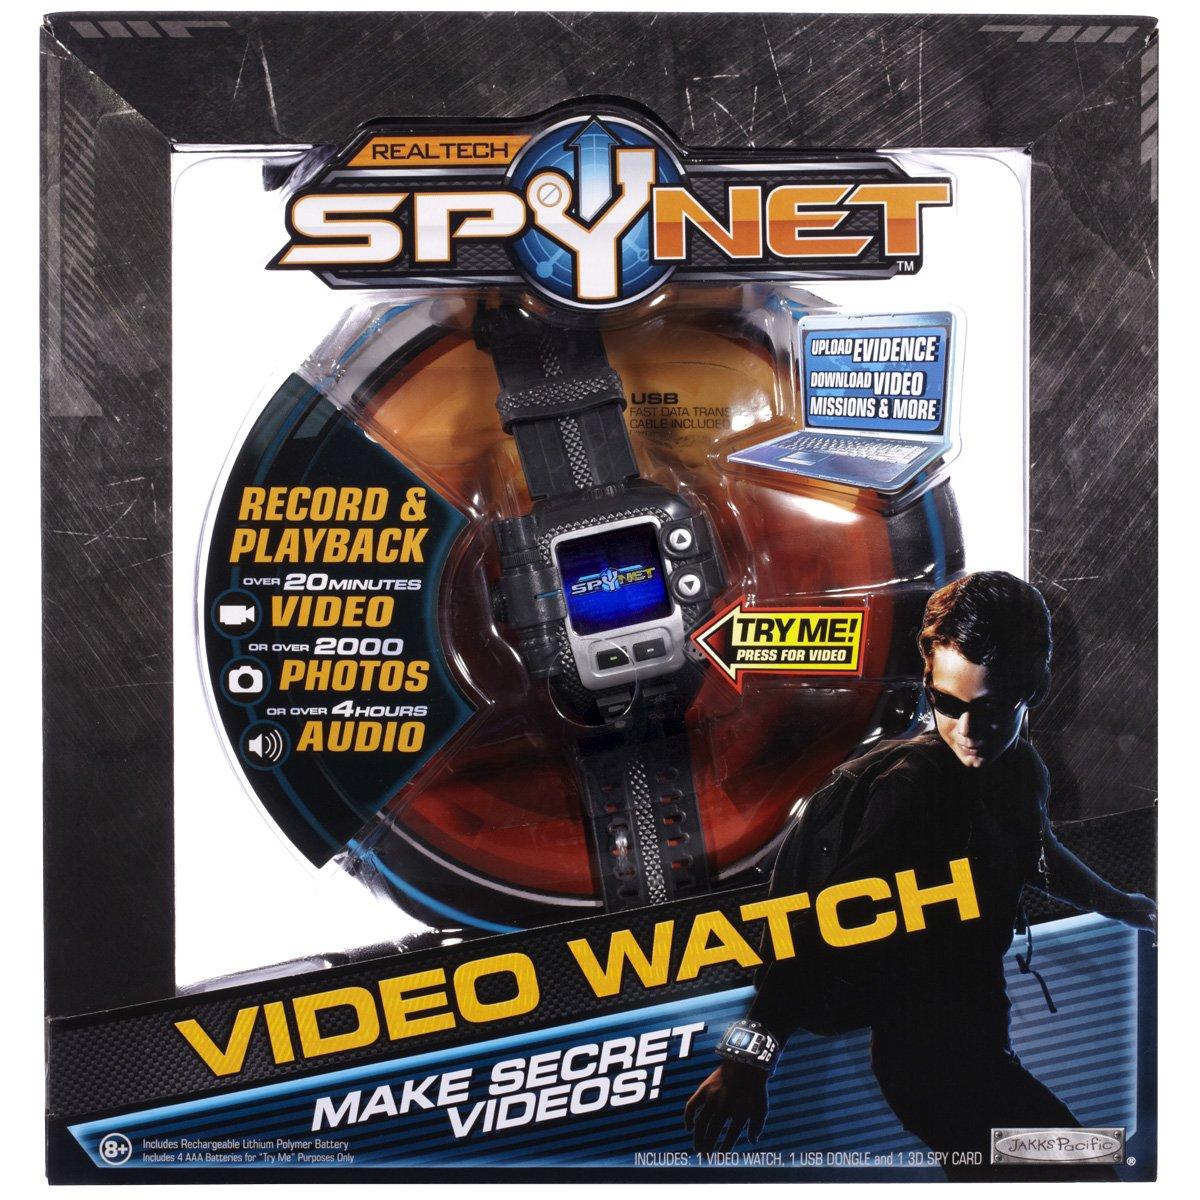 Spy Net: Secret Mission Video Watch by SpyNet